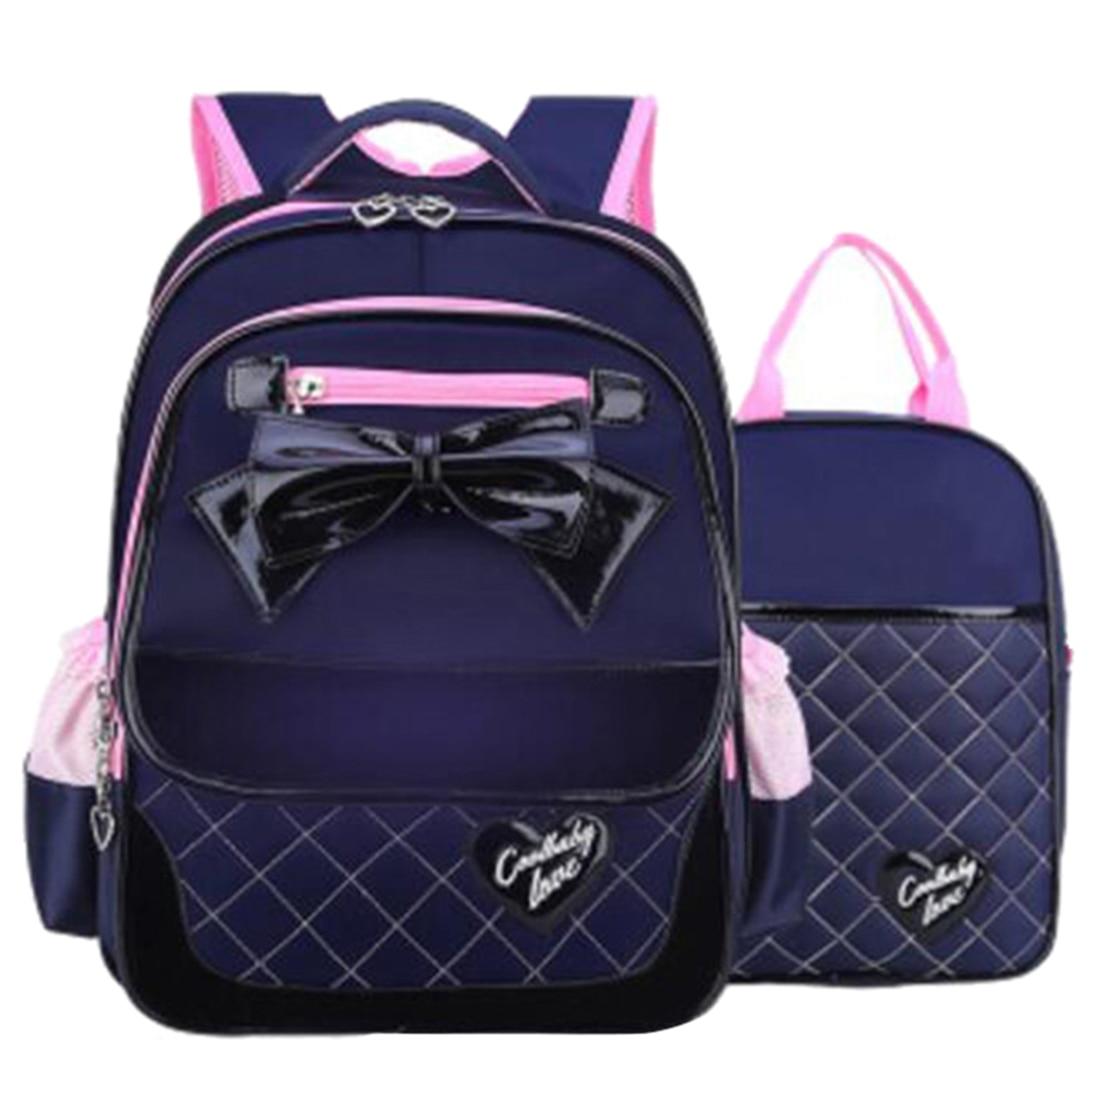 2 Pcs Set Han edition princess girls backpack Female bag wear resisting PU leather School bag